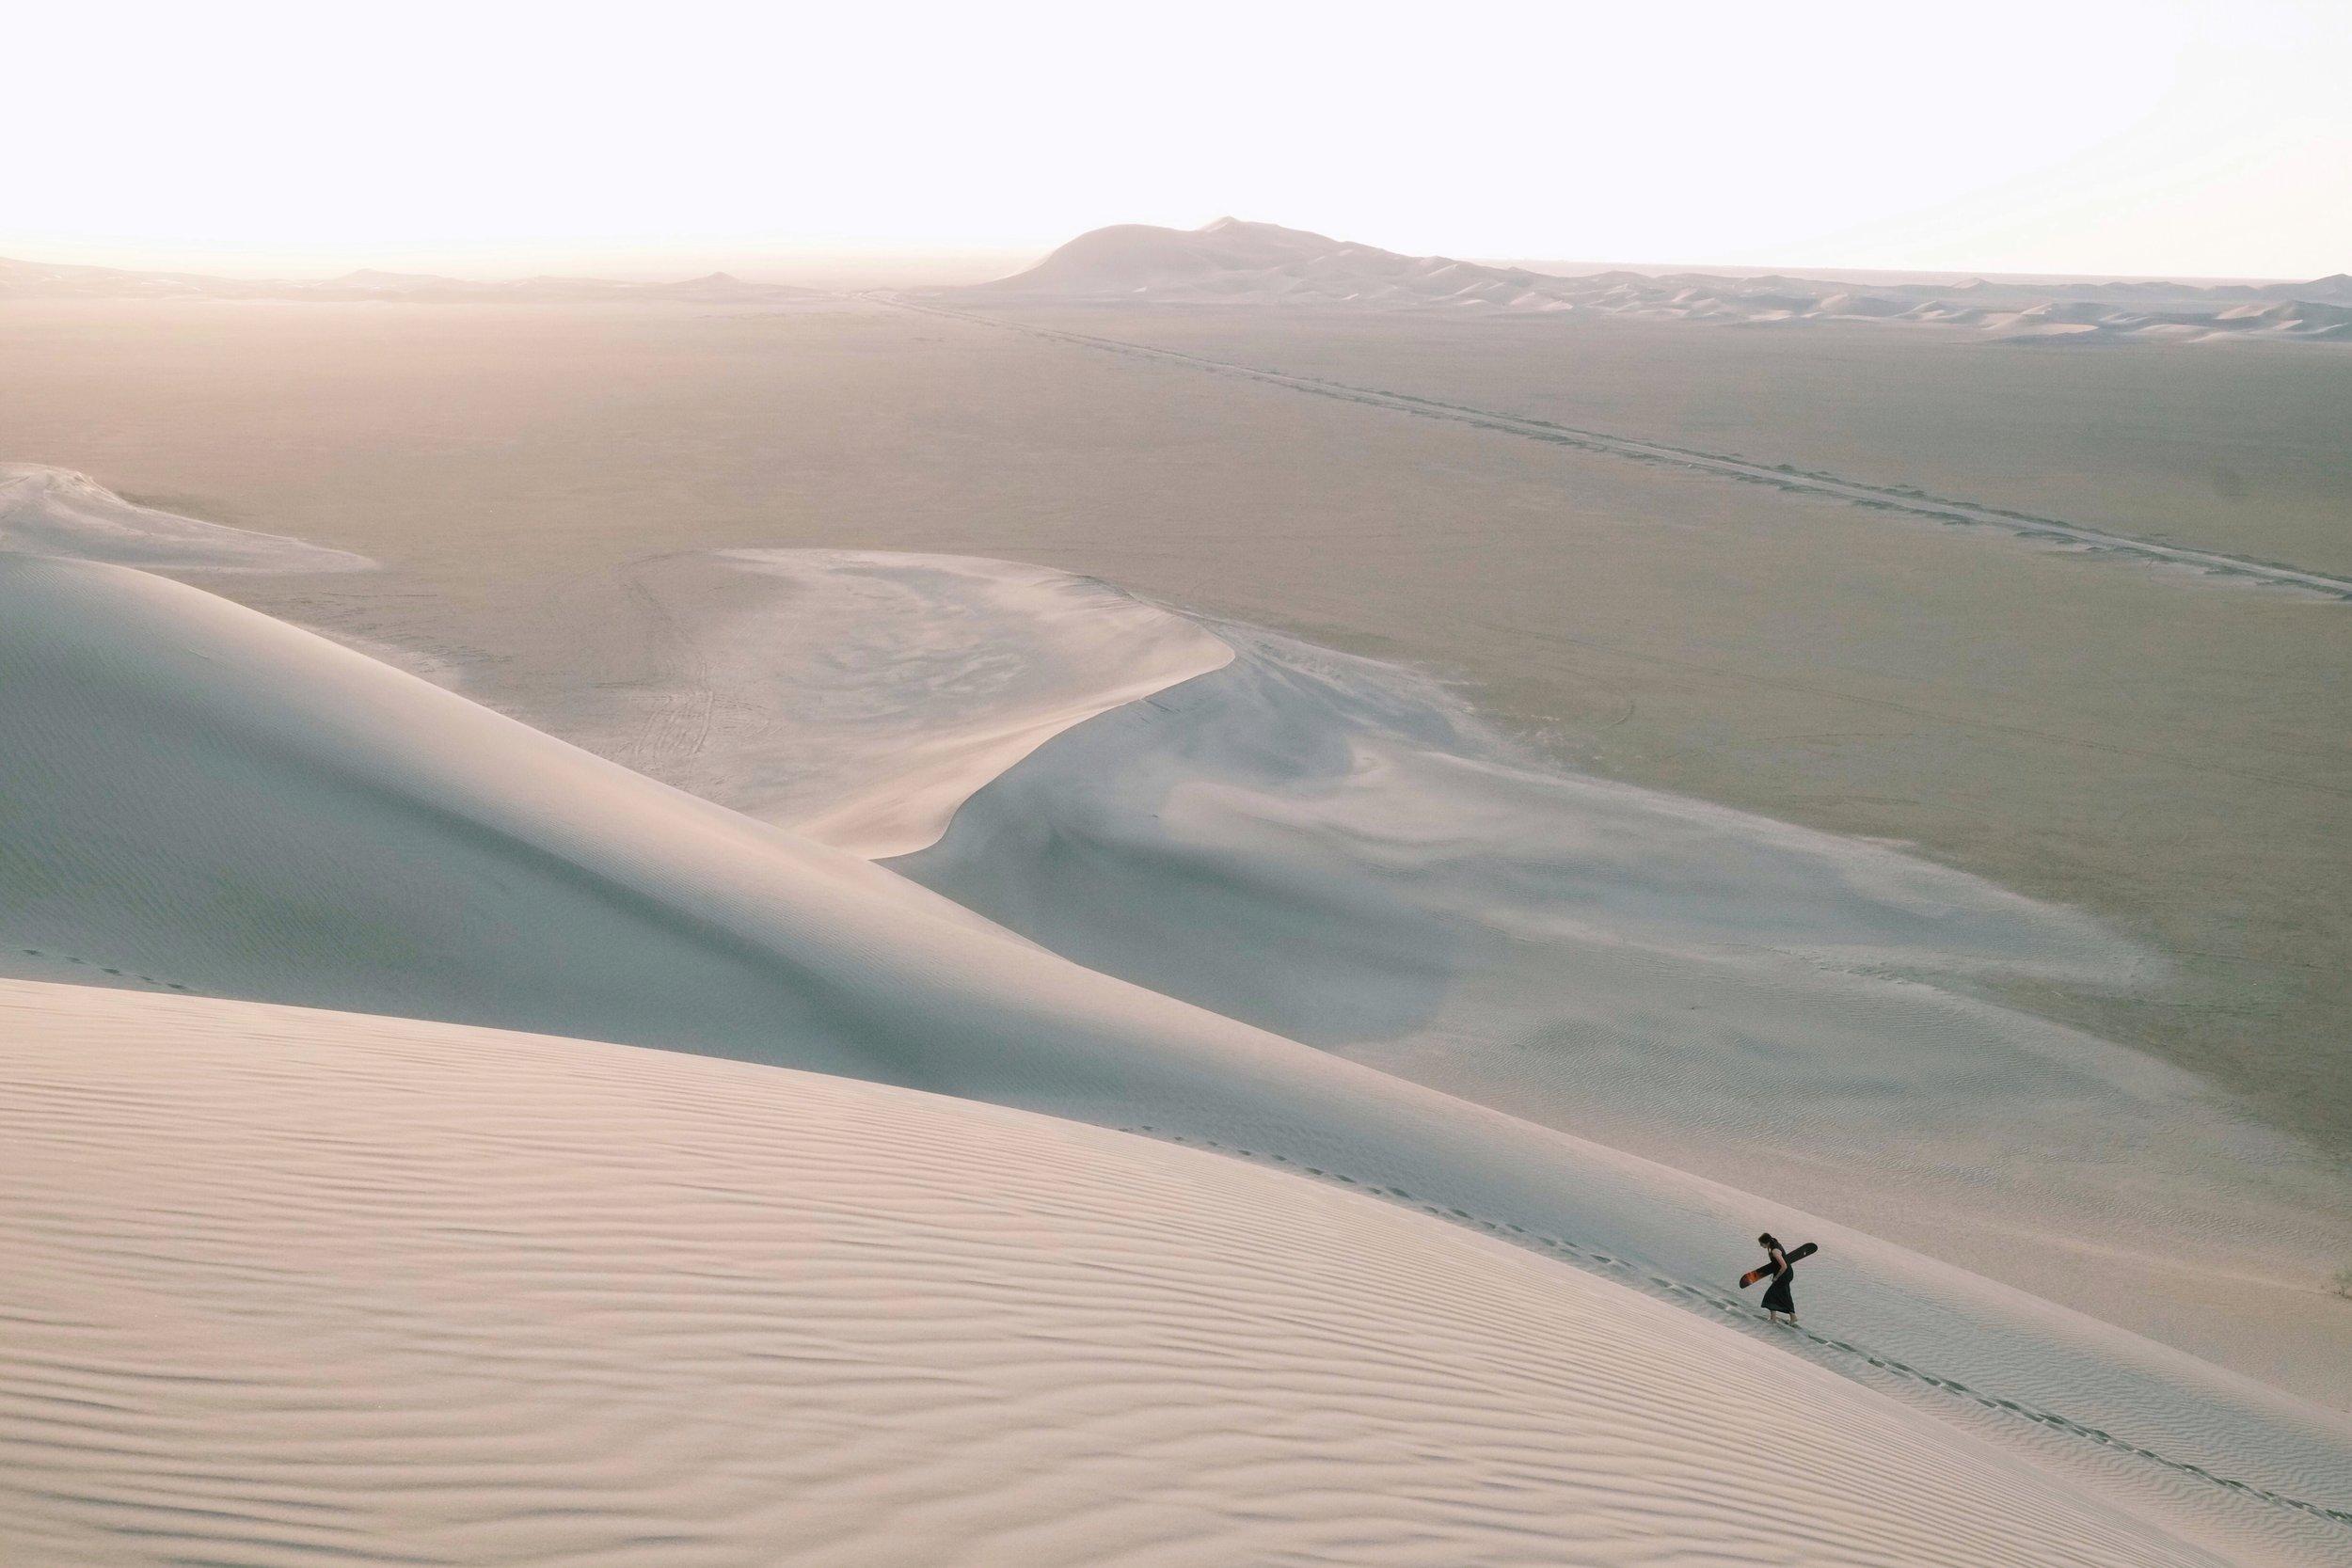 Yazd sand dunes desert in Iran by Joost Bastmeijer.jpeg